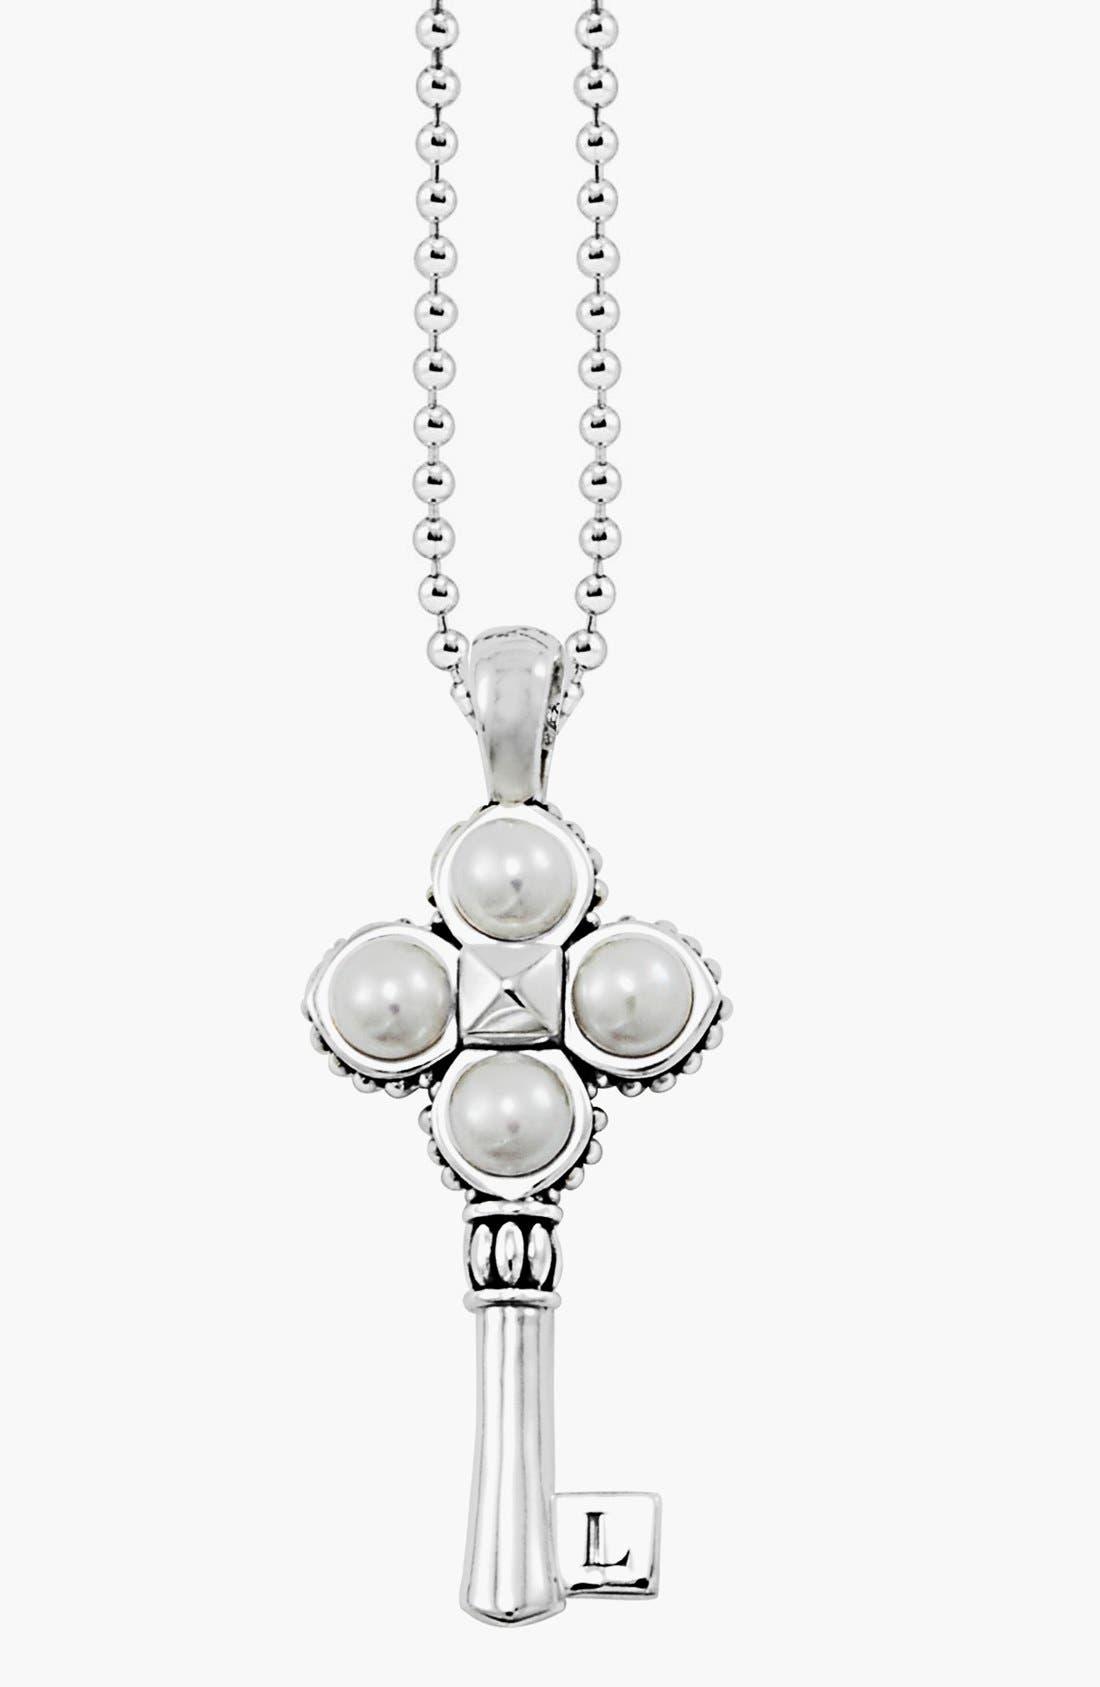 LAGOS 'Luna' Pearl Long Key Pendant Necklace